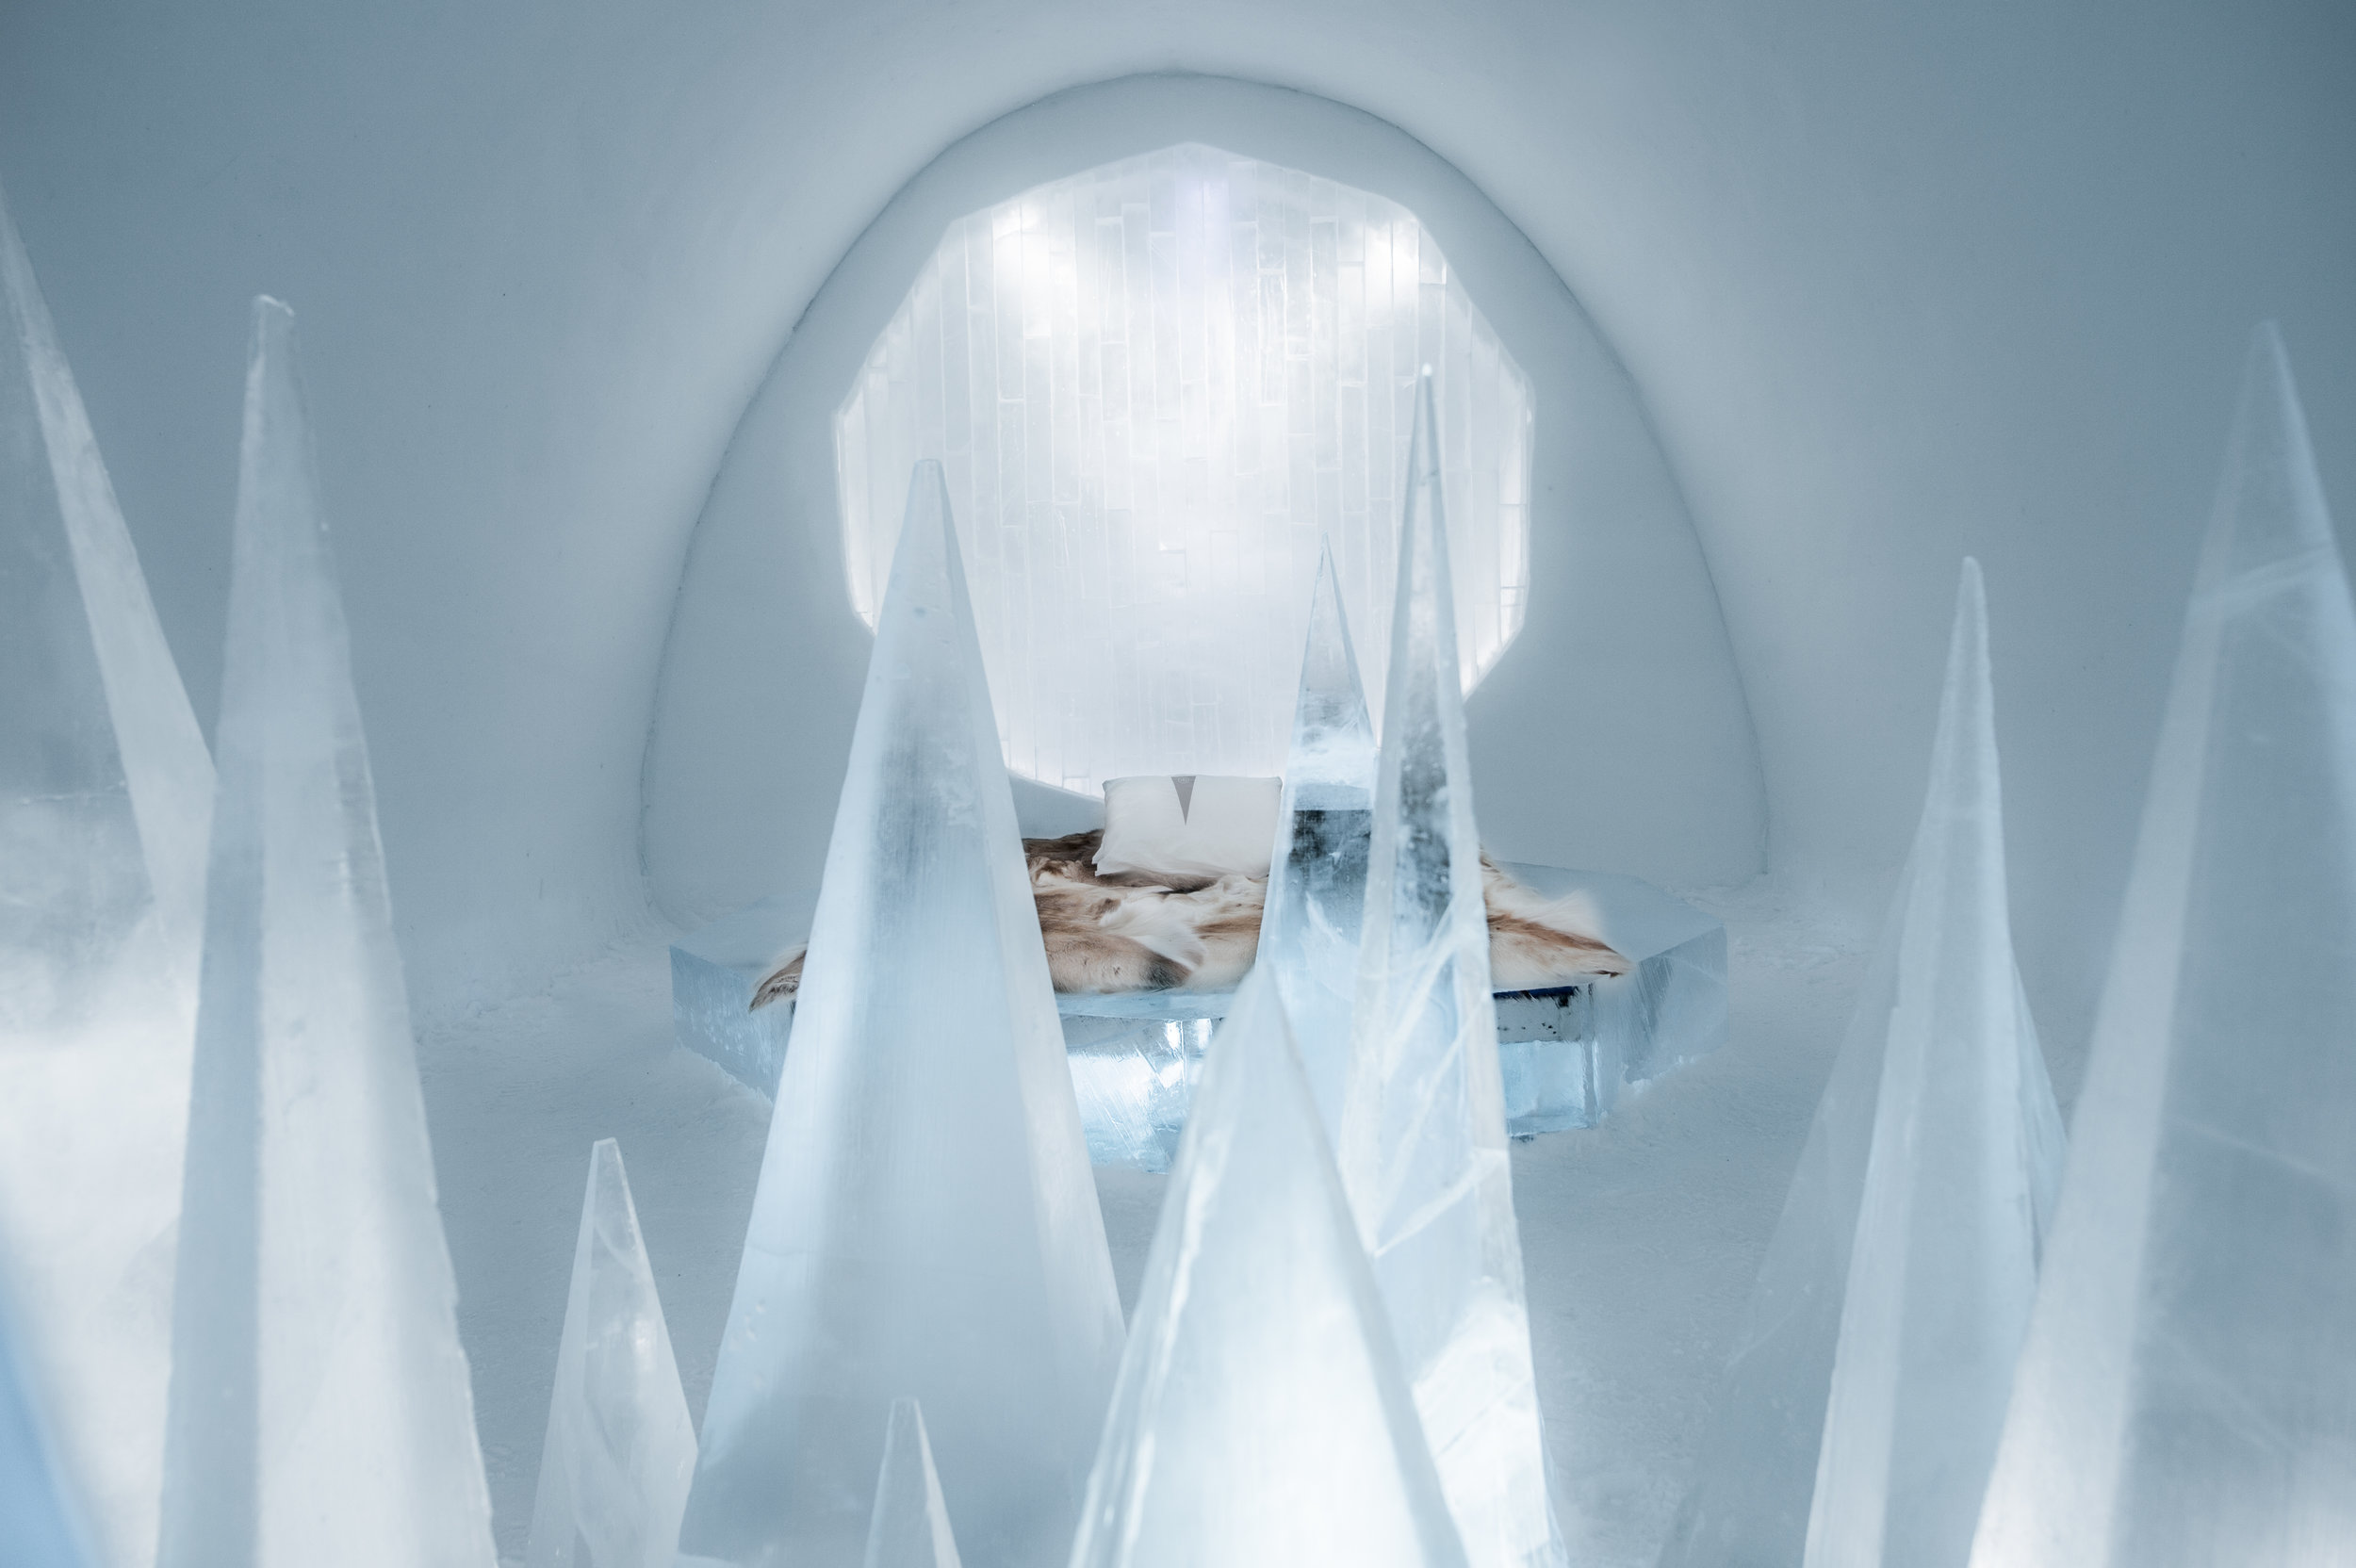 Art suite -White Desert-Timsam Harding & Fabián Jacquet Casado ICEHOTEL 28  Photo by - Asaf Kliger.jpg